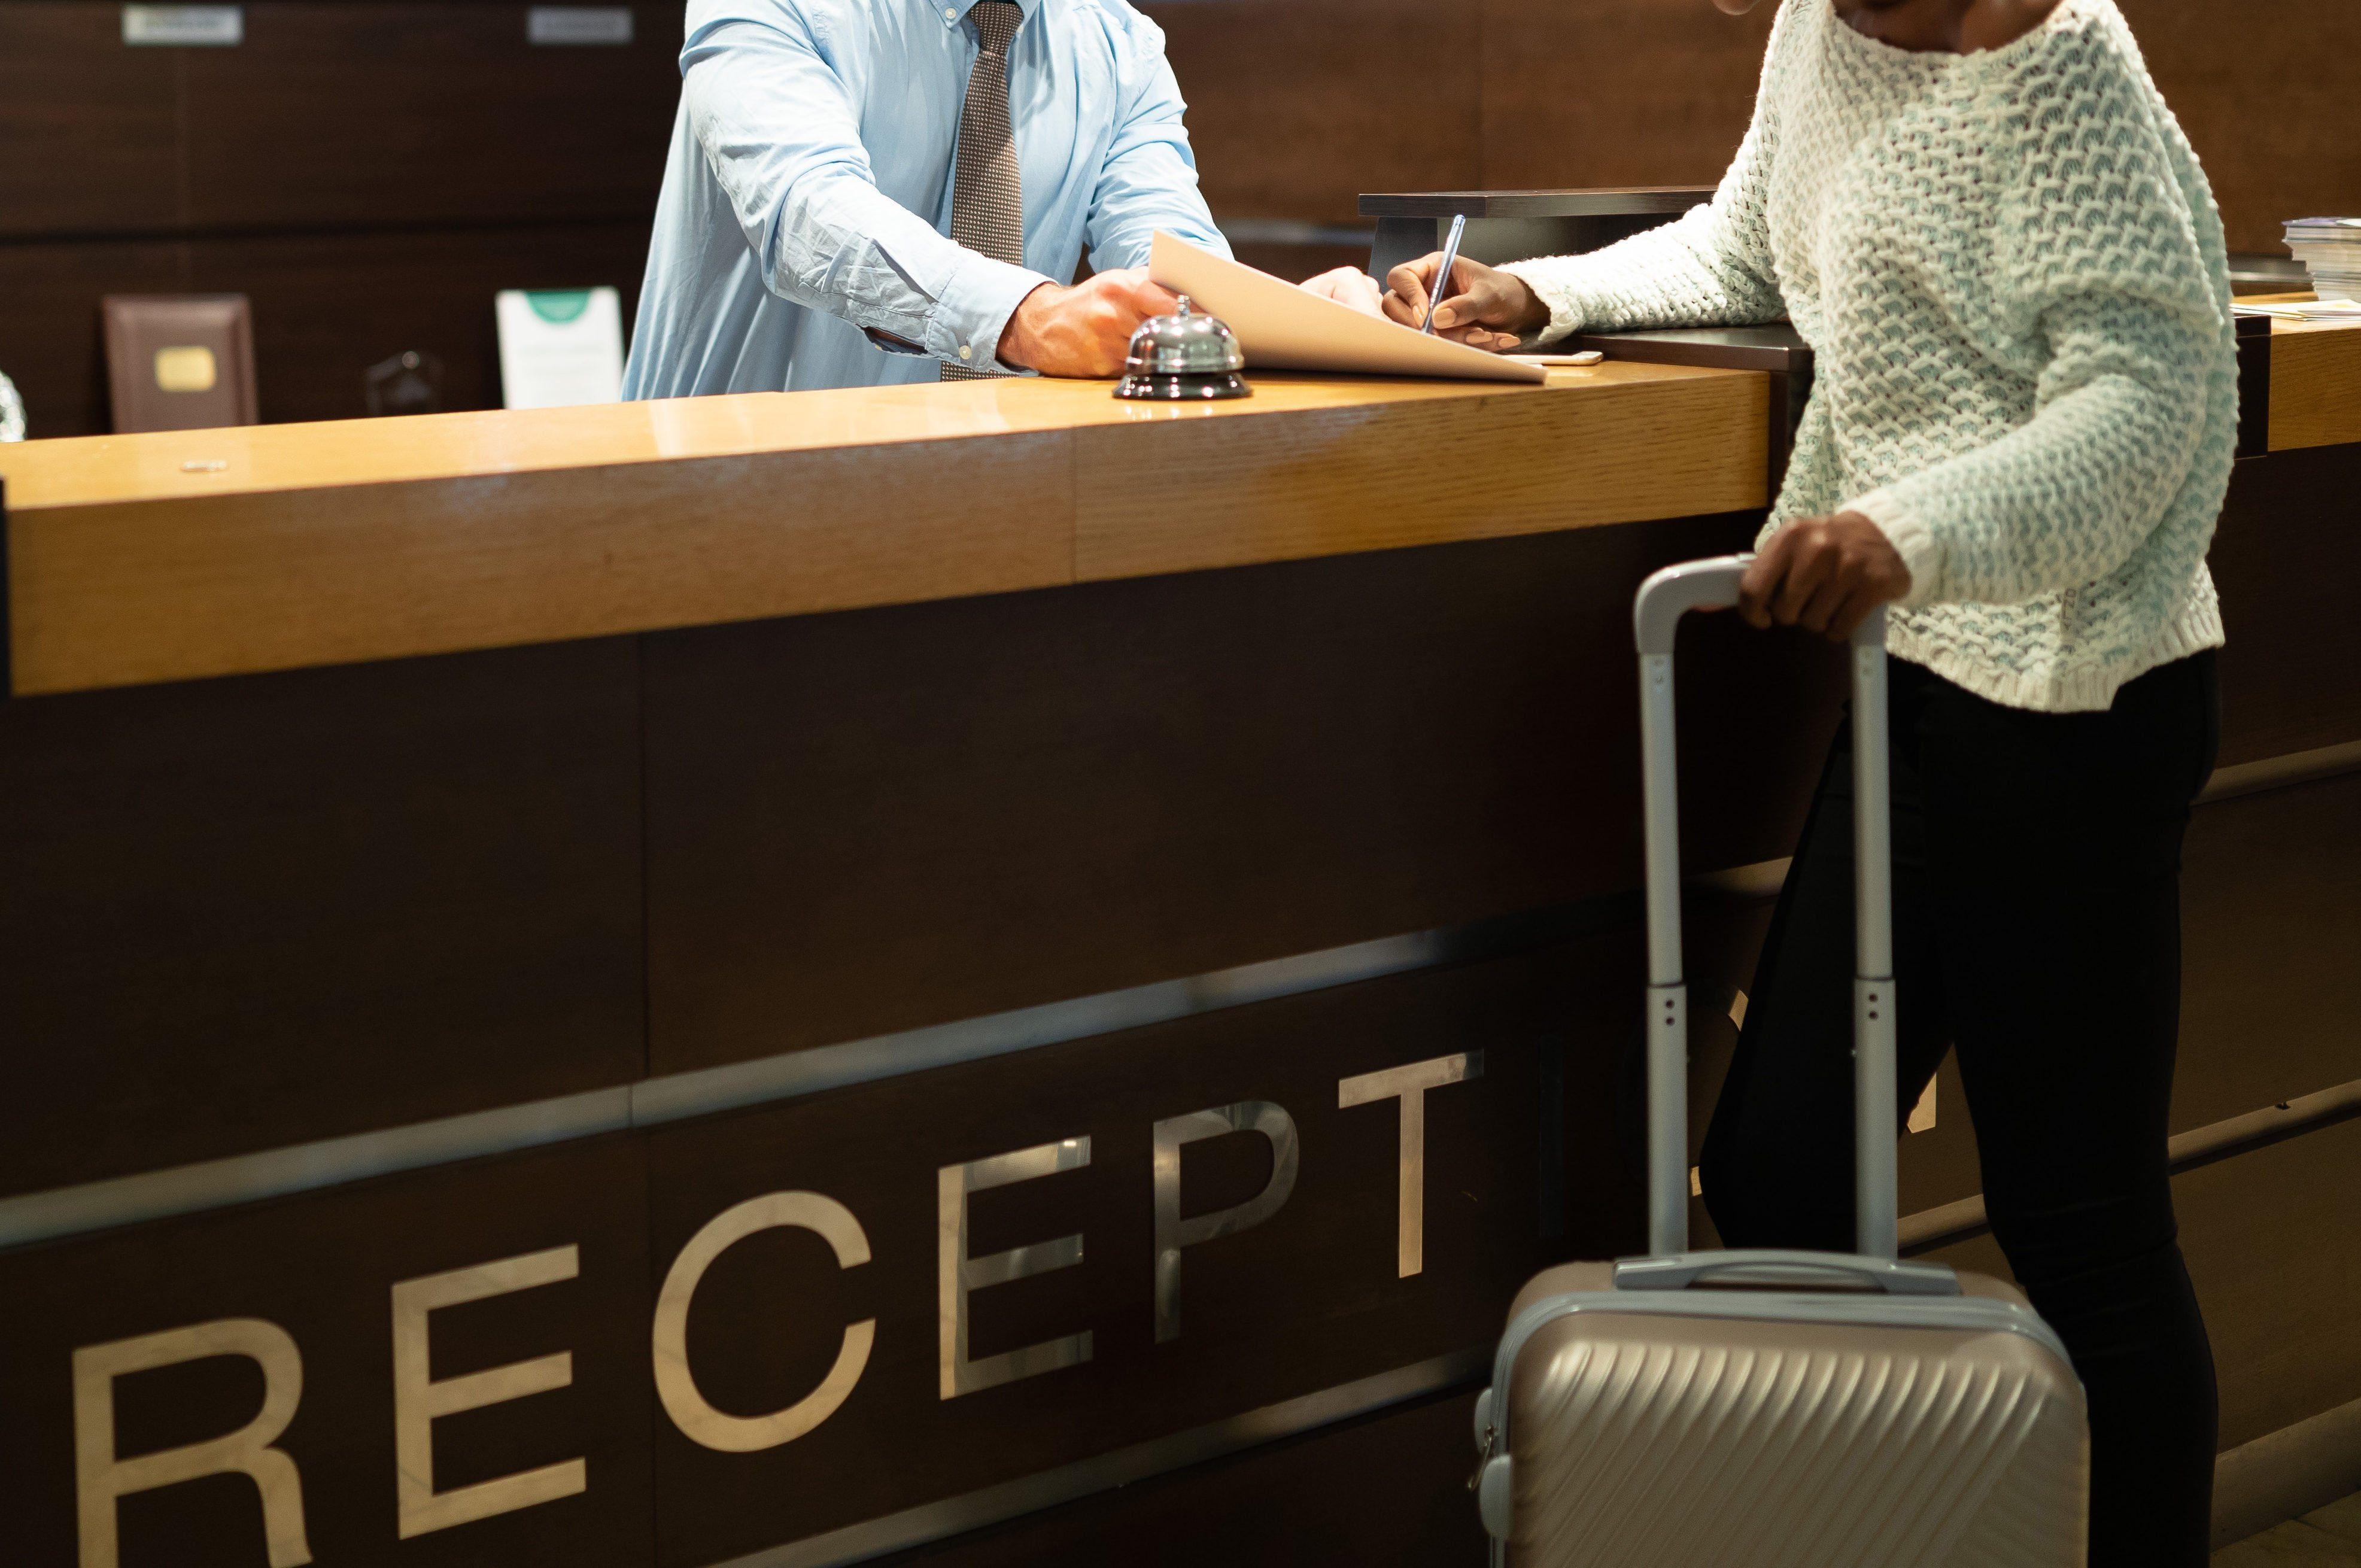 Tourist register in hotel